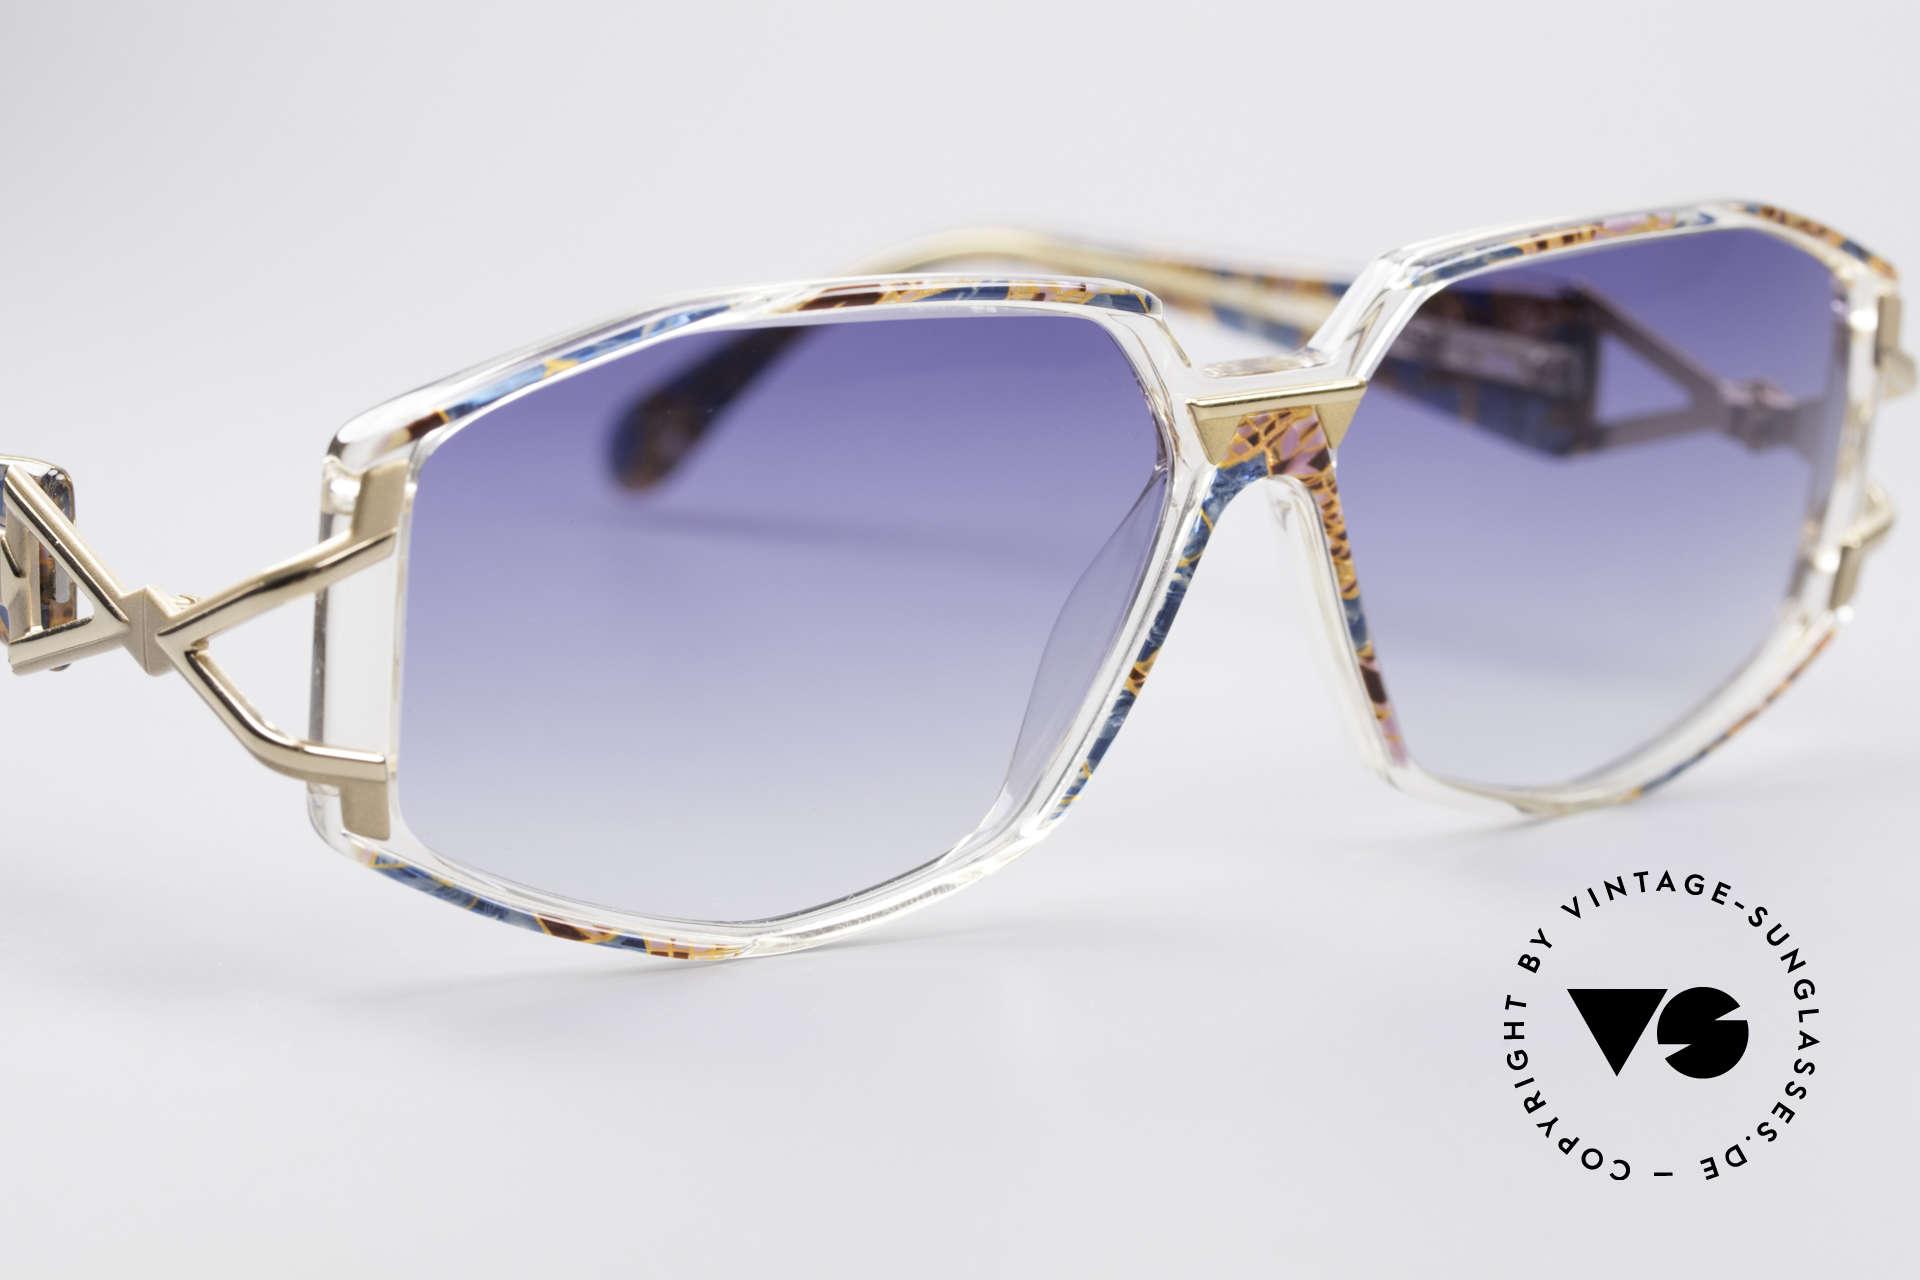 Cazal 368 90's Hip Hop Old School Shades, unworn (like all our rare VINTAGE designer sunglasses), Made for Women